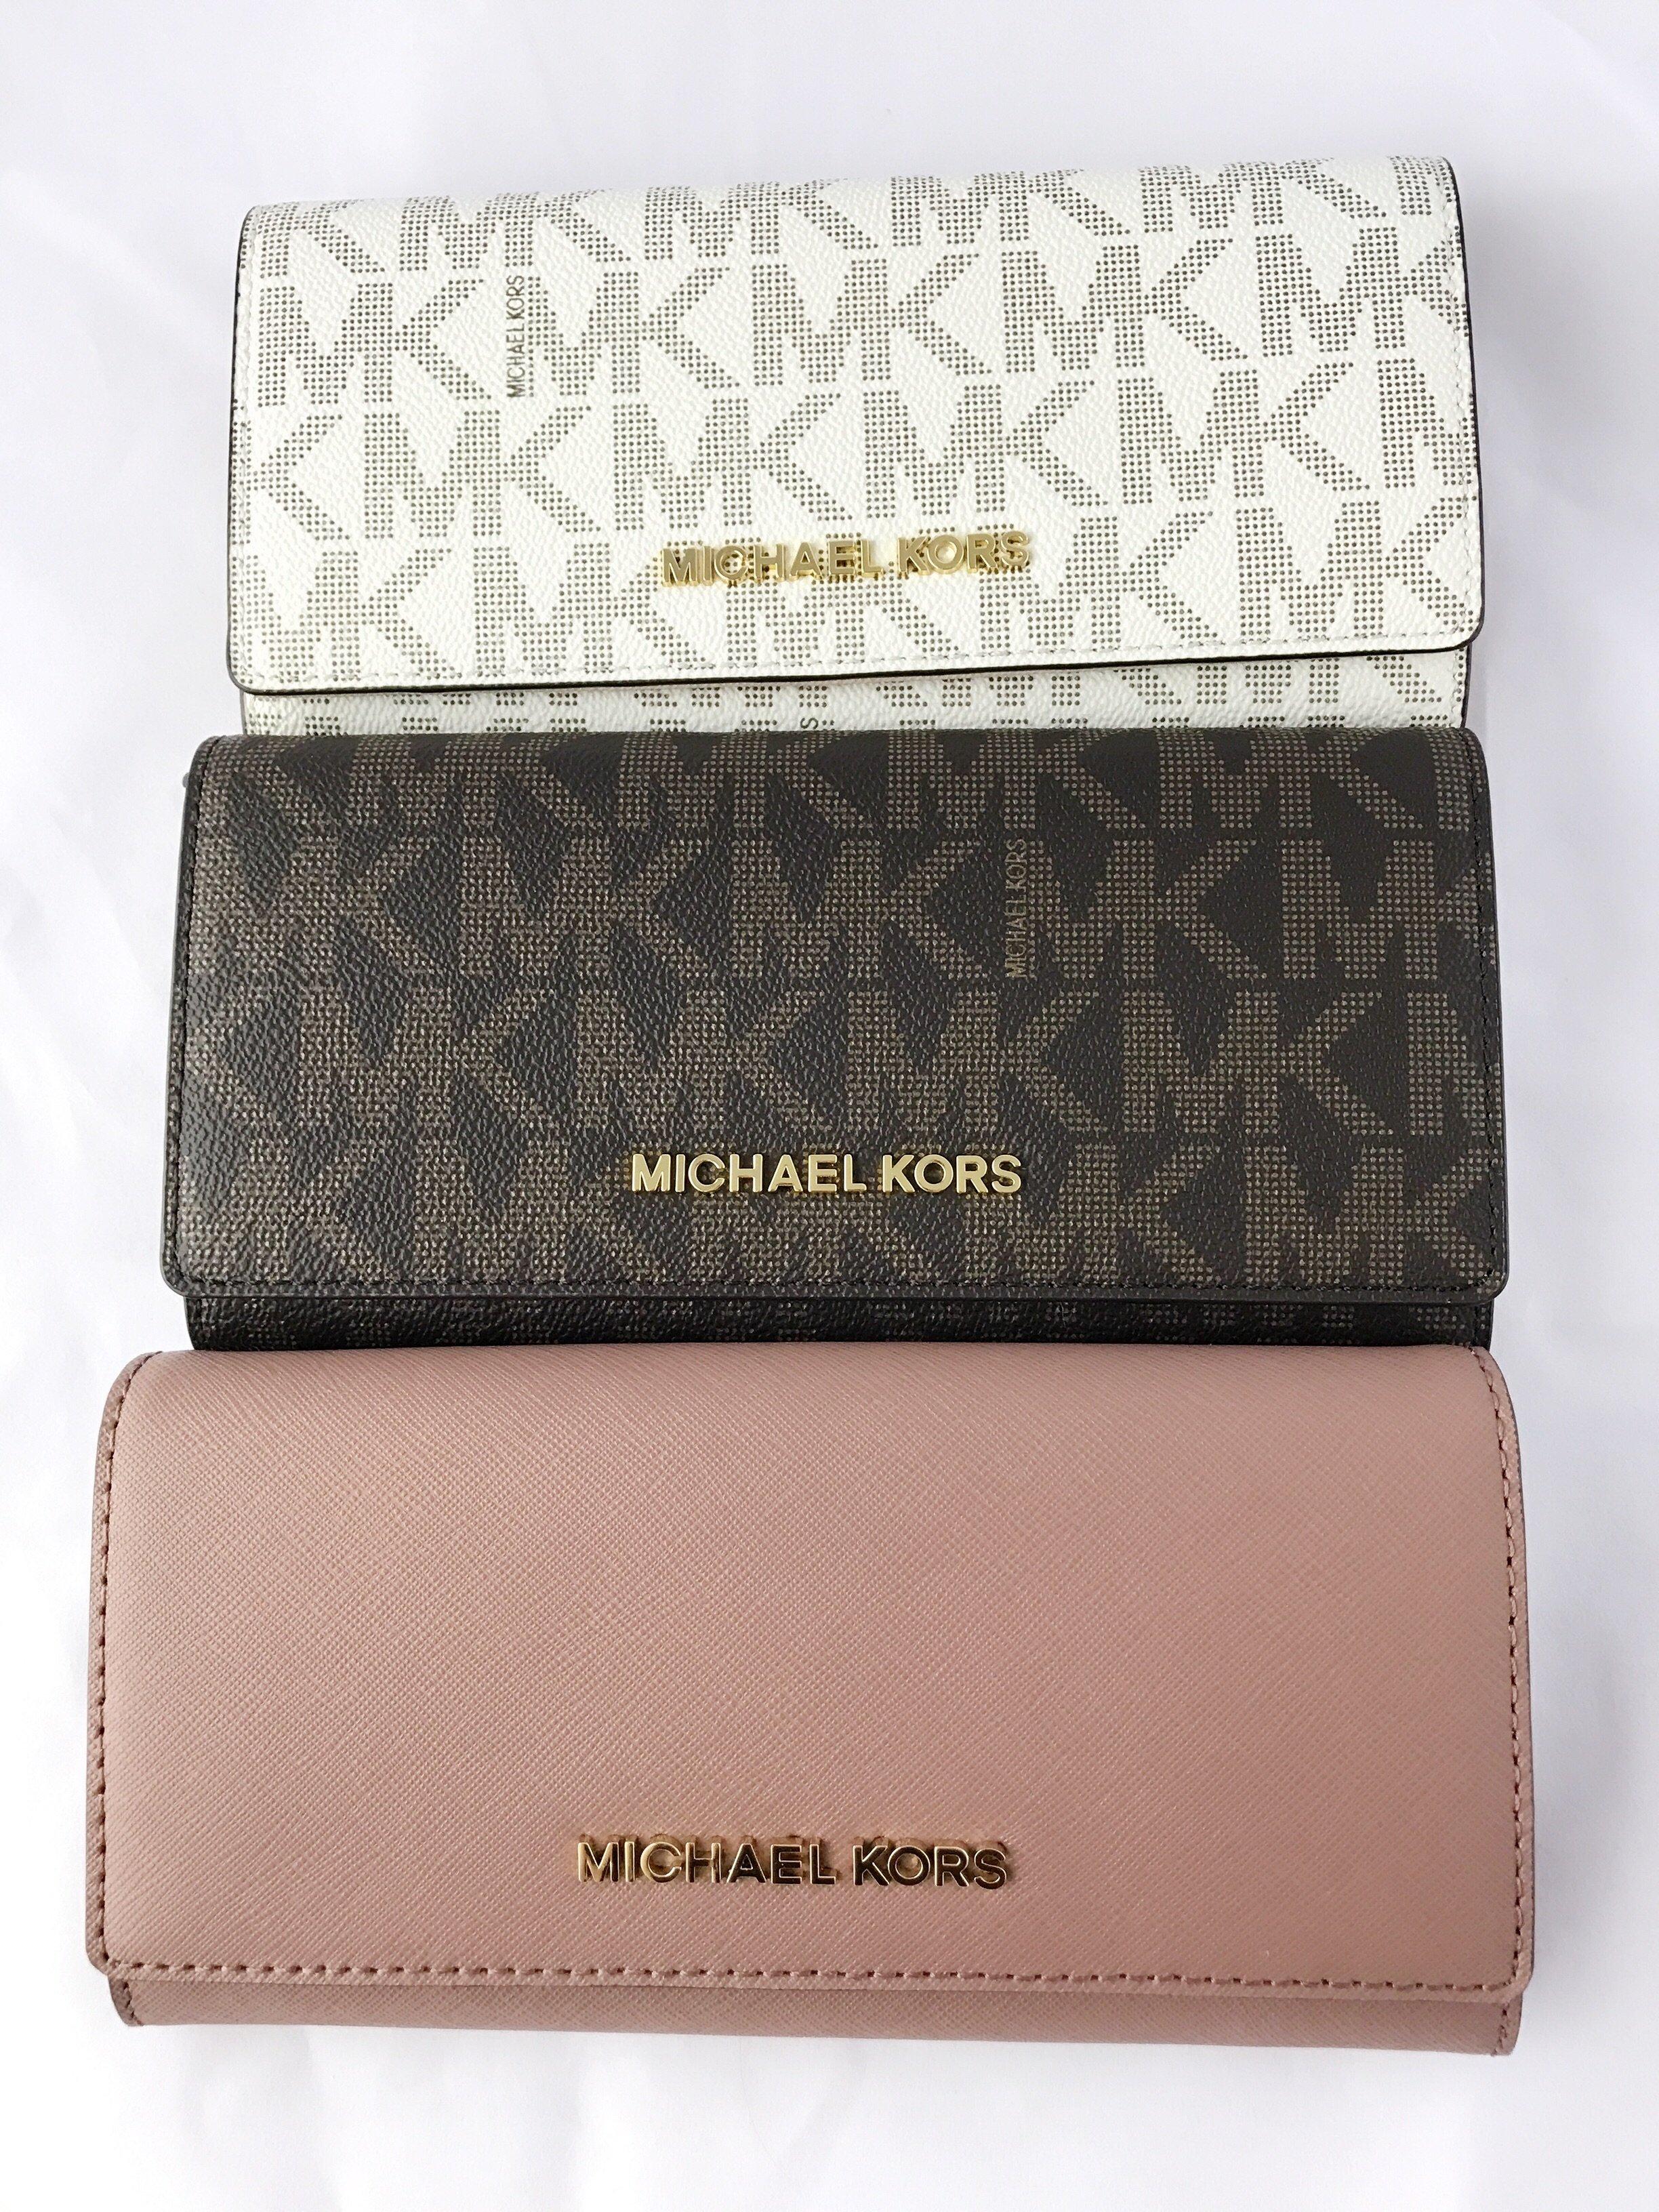 michael kors jet set travel wallet saffiano leather brown vanilla rh ebay com